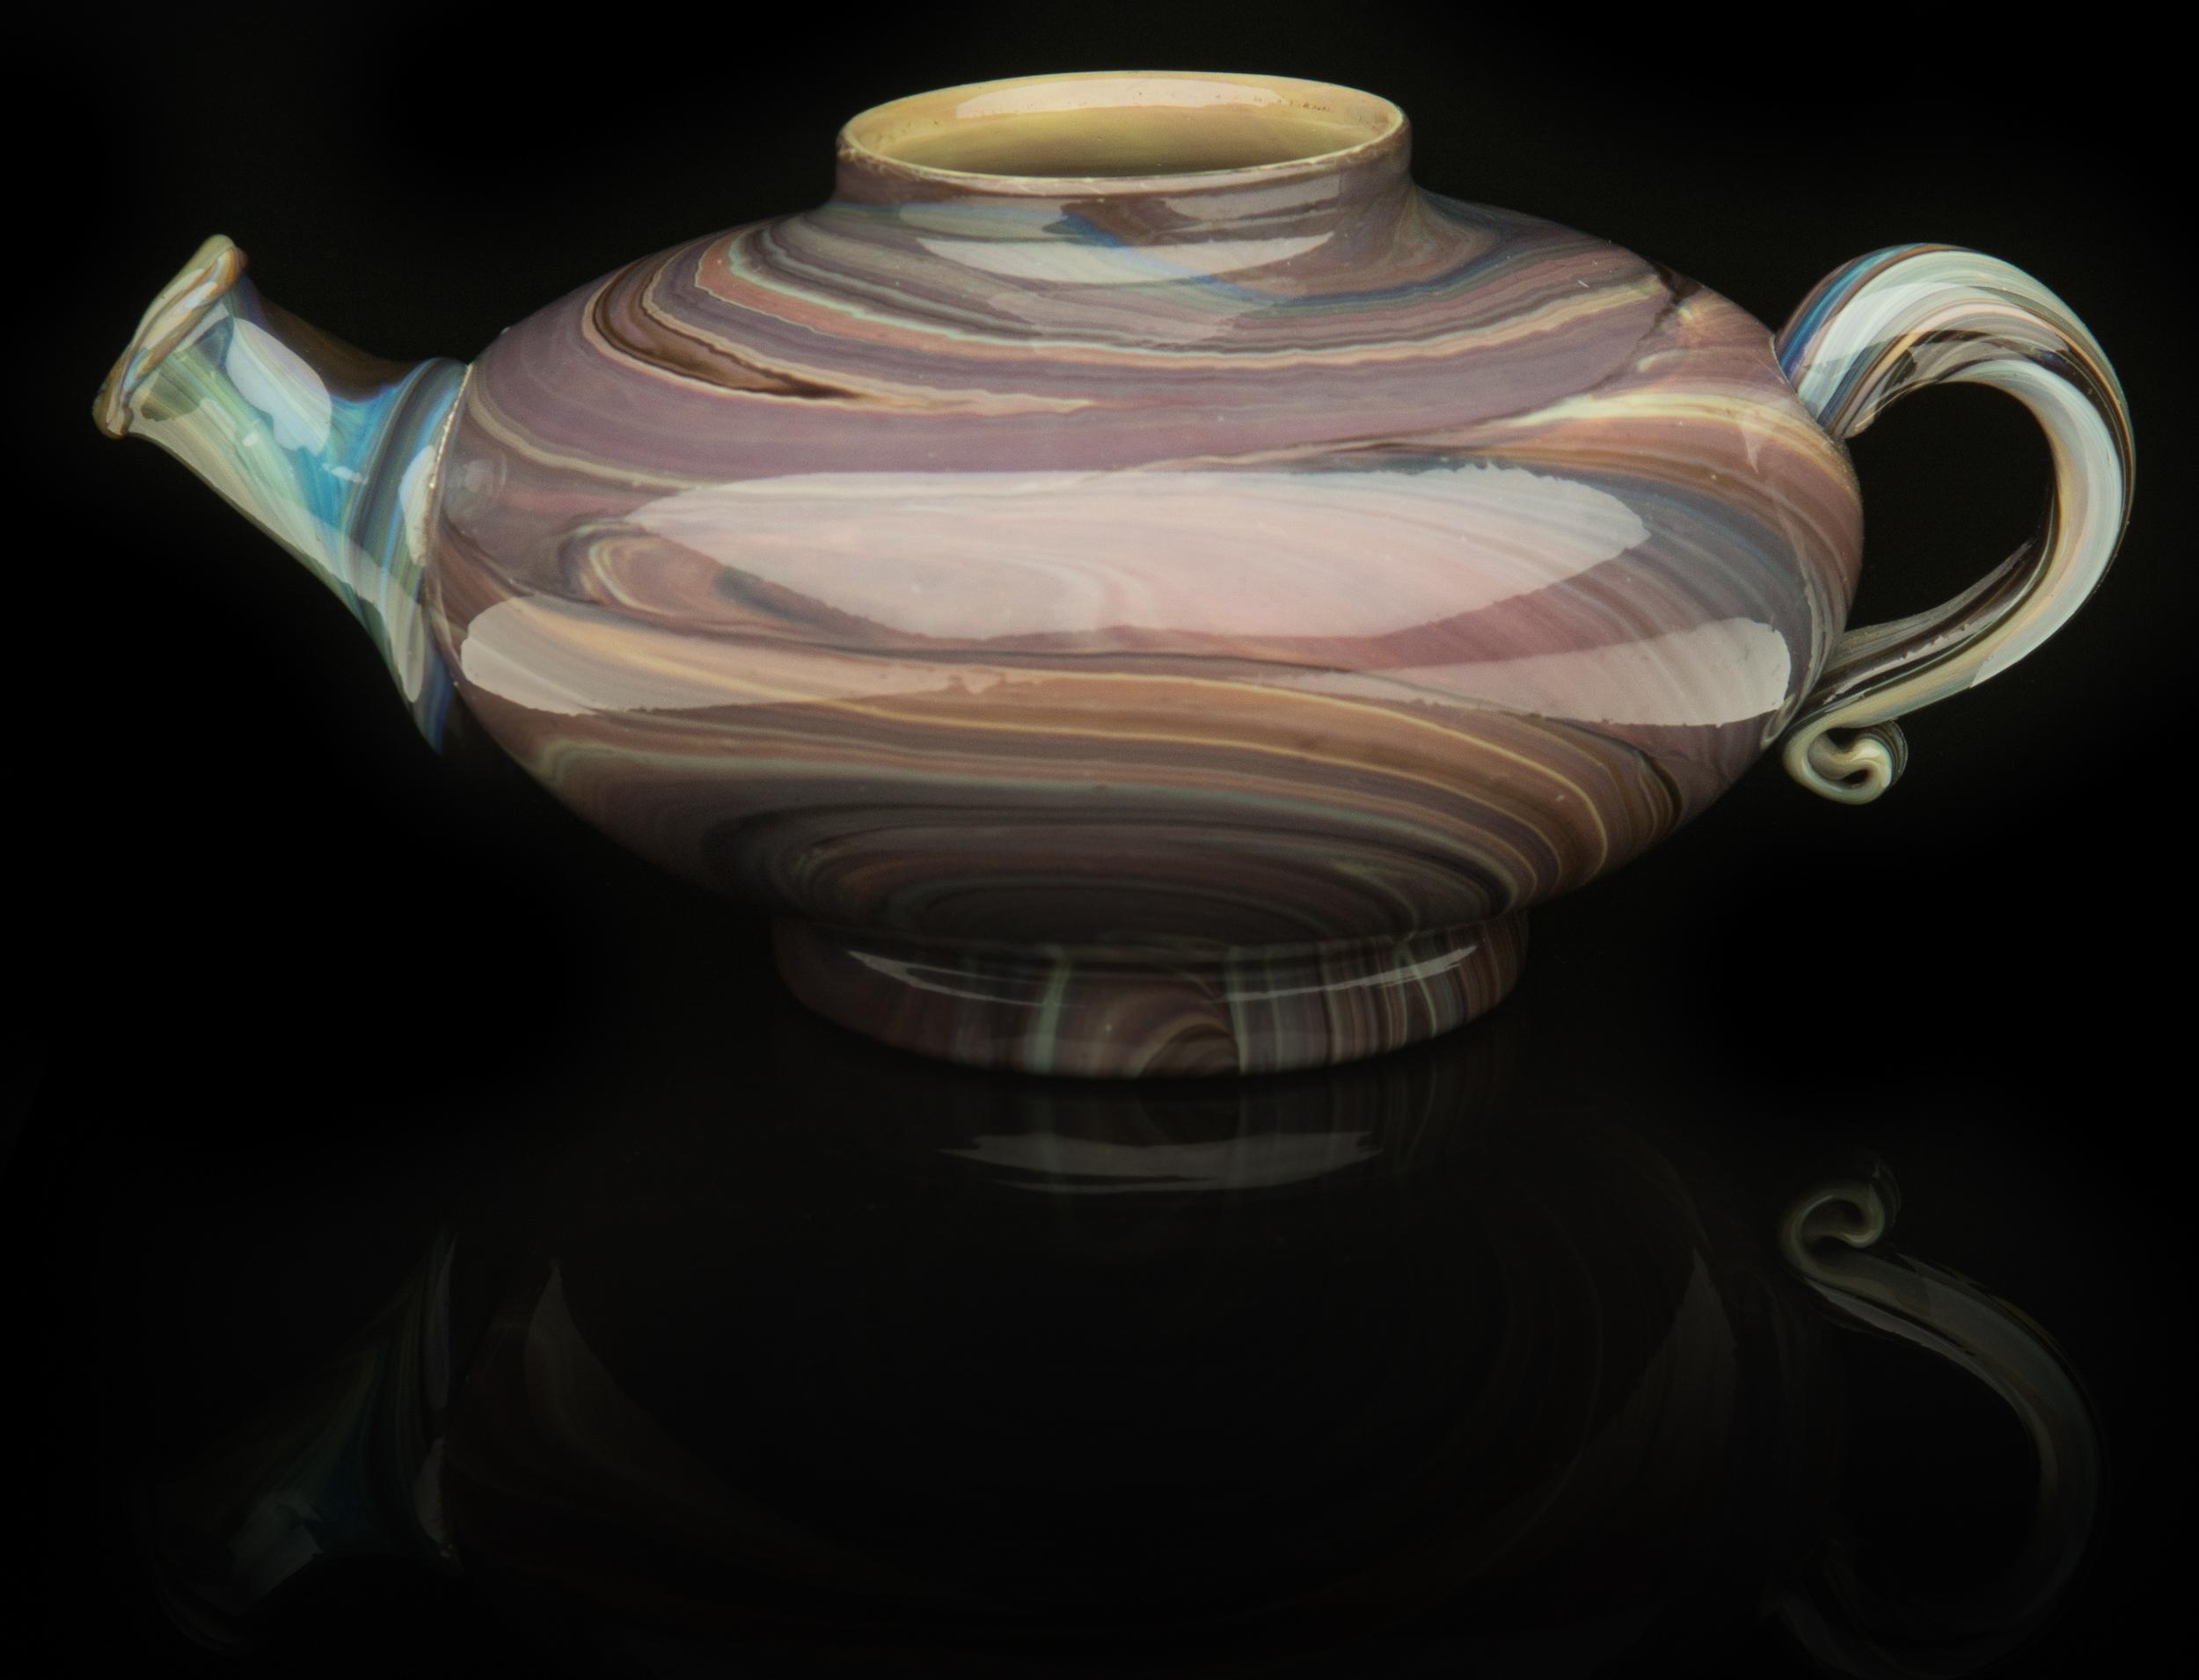 Salviati and Company,  Chalcedony Teapot (circa 1870, glass, 4 1/2 x 8inches), VV.575